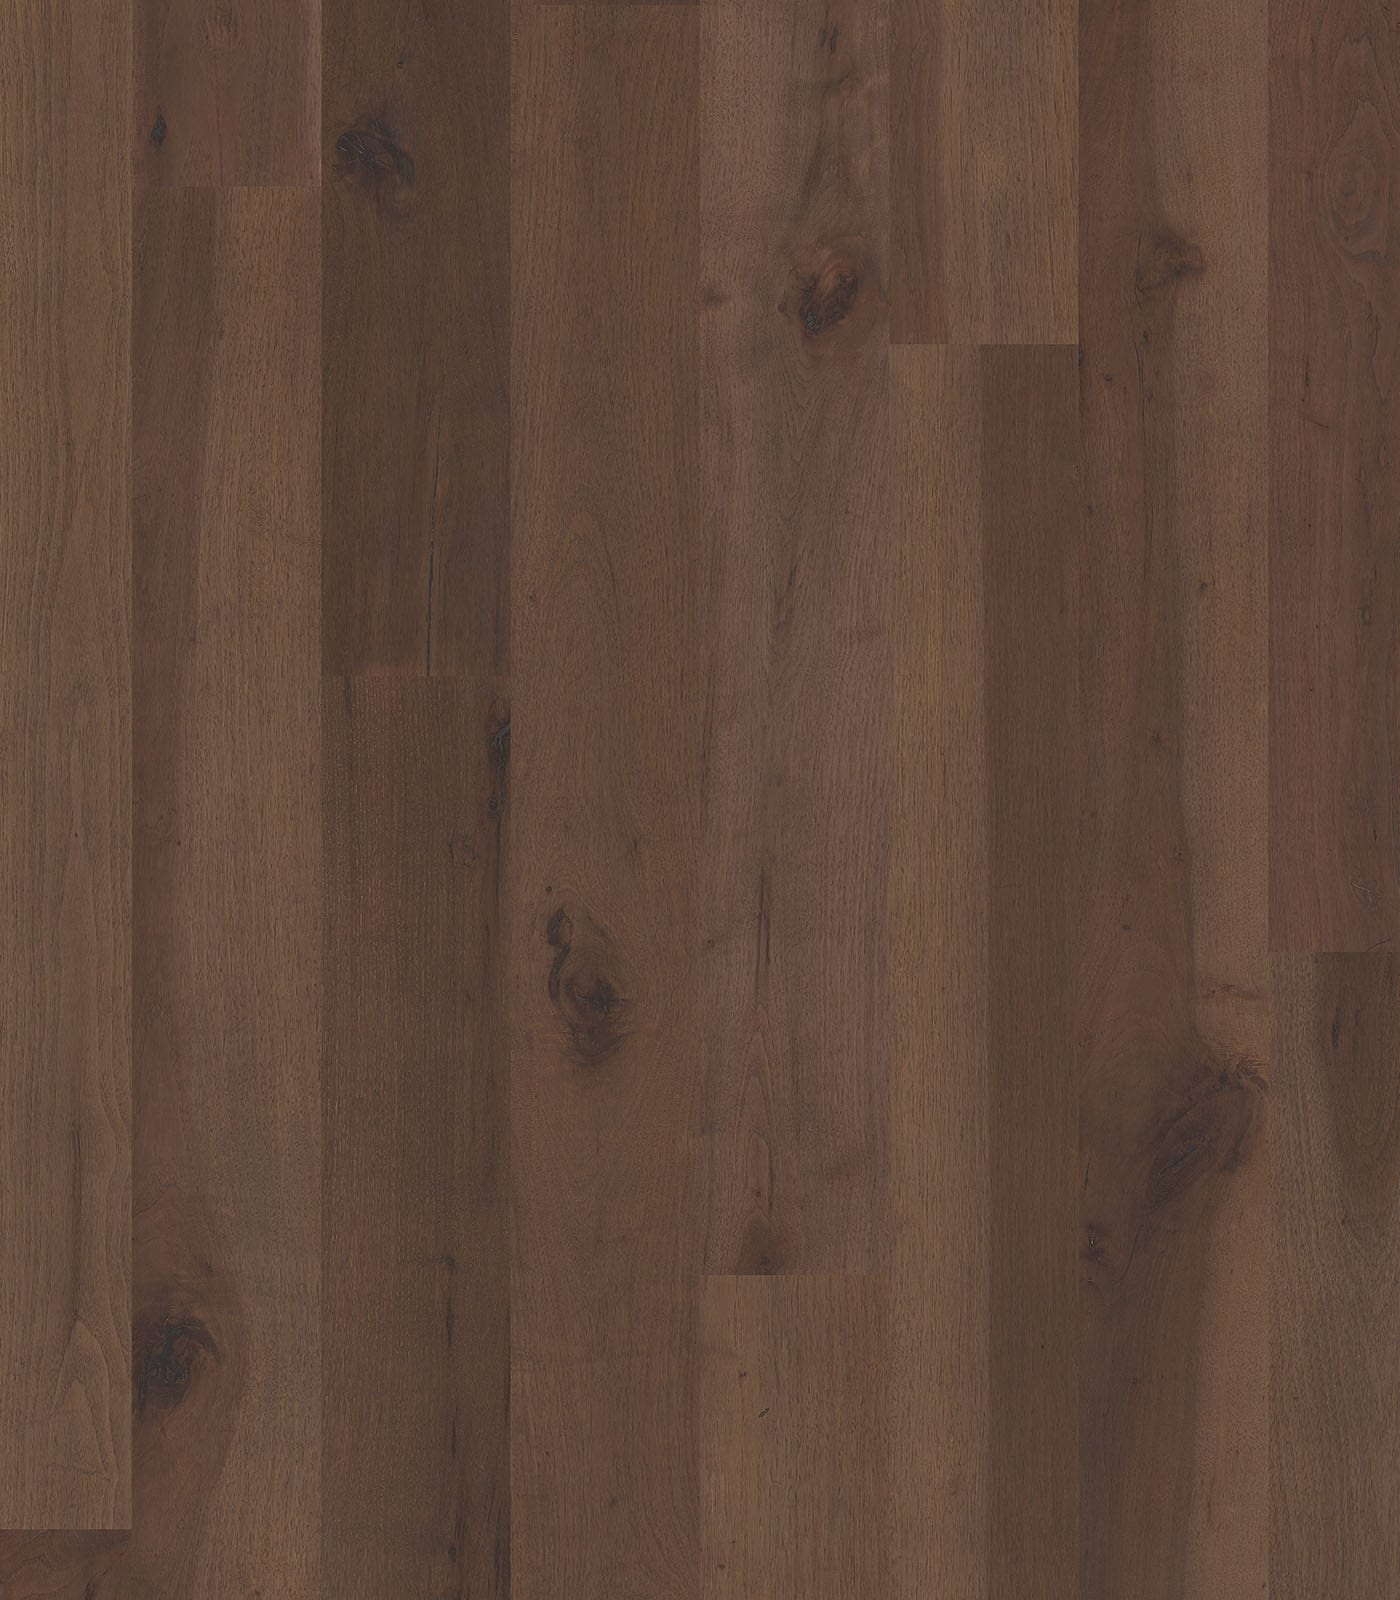 Tulsa-Pecan engineered floors-After Oak Collection - flat